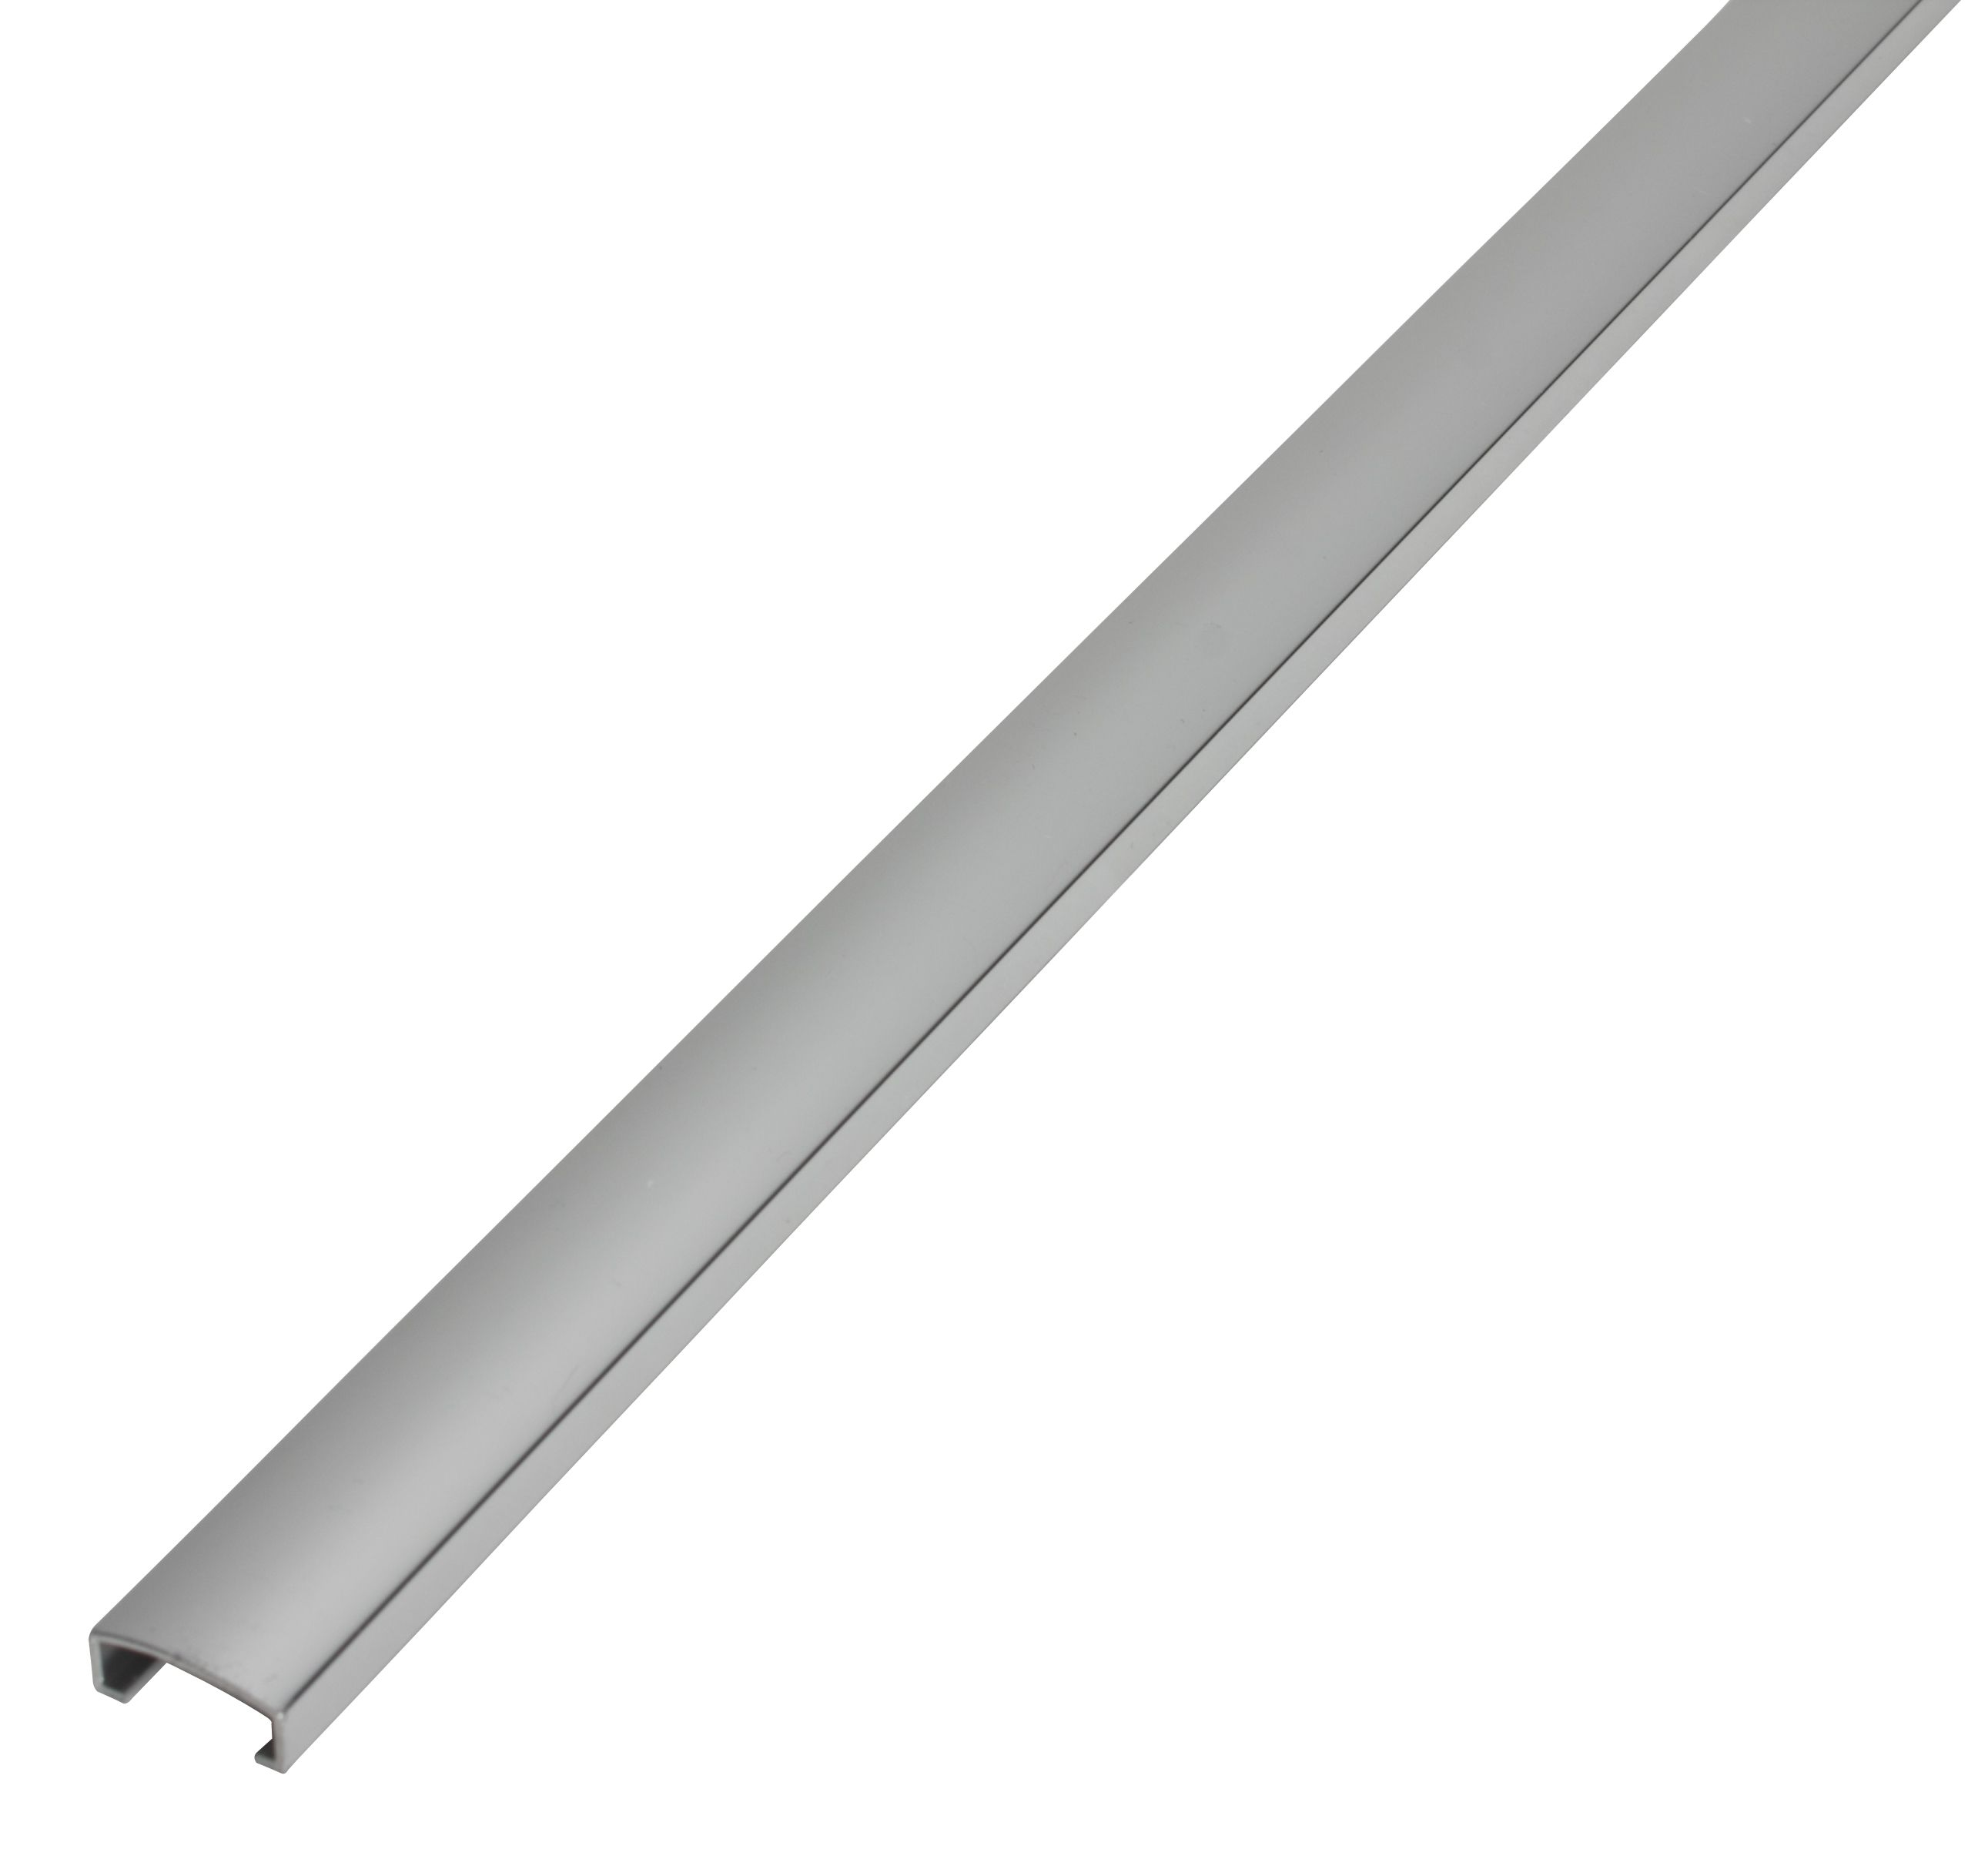 diall chrome aluminium listello tile trim departments. Black Bedroom Furniture Sets. Home Design Ideas